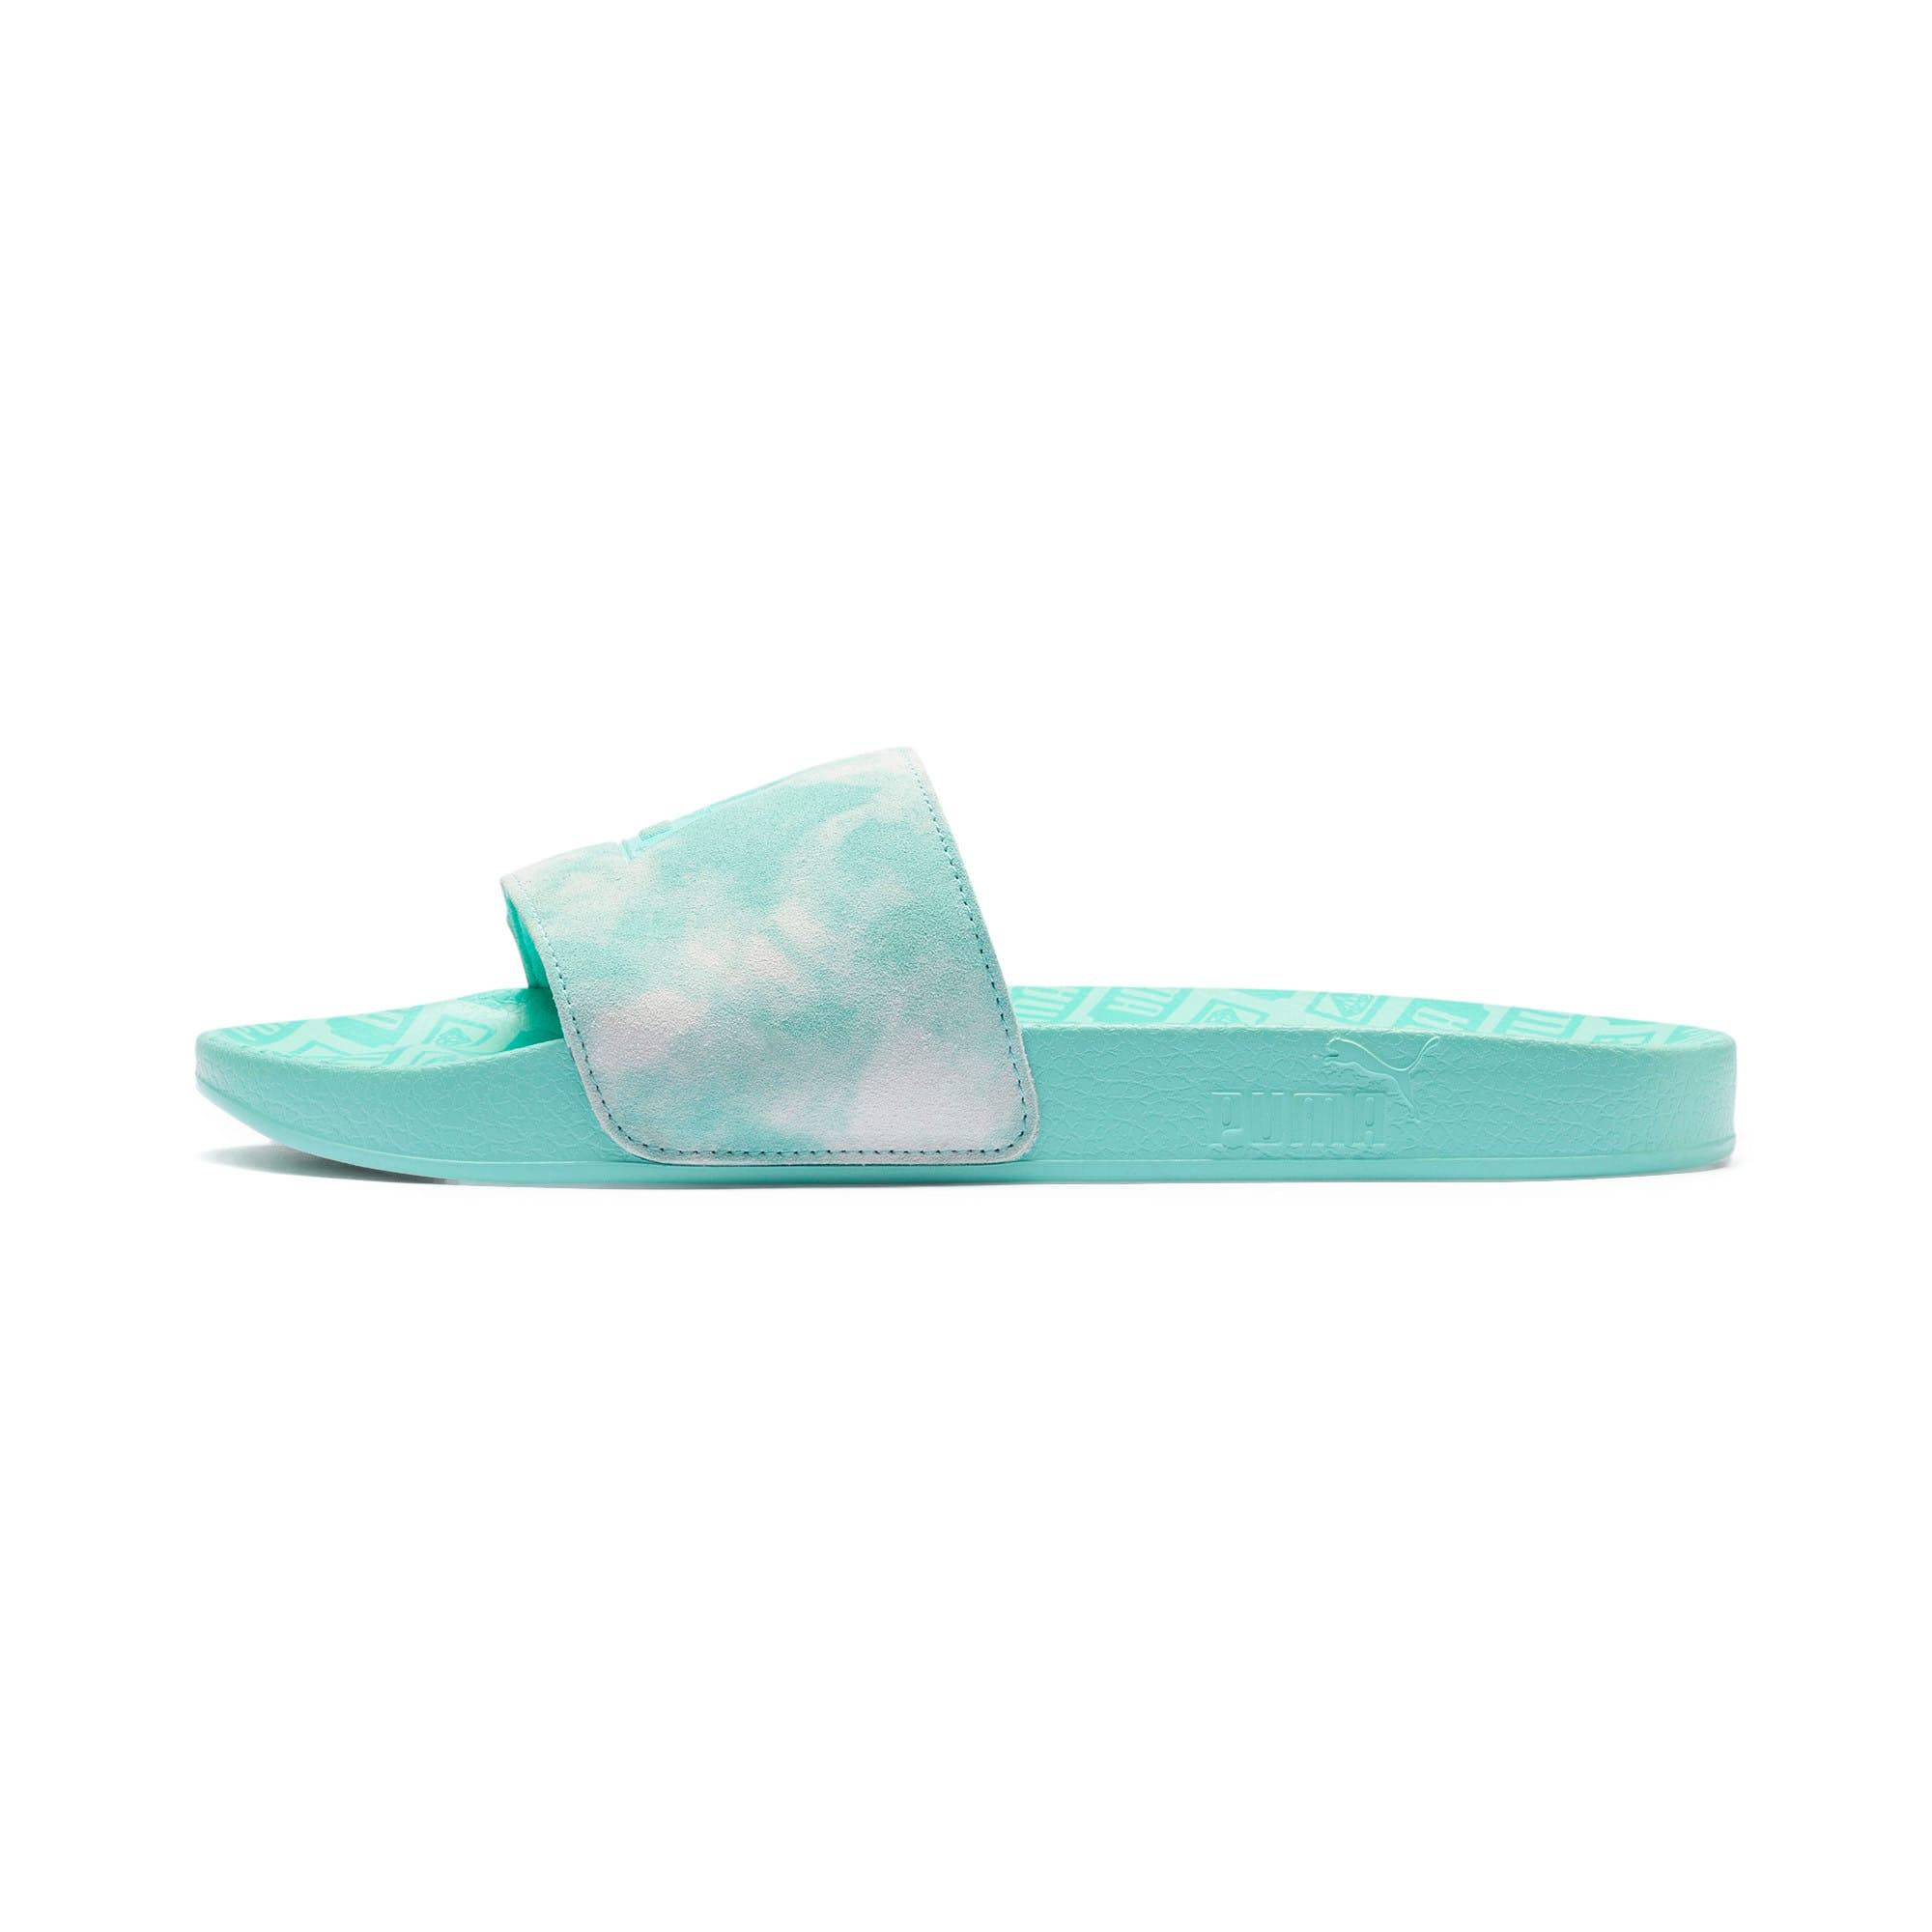 Thumbnail 1 of PUMA x DIAMOND SUPPLY CO. Leadcat Slides, Desert Flower-Diamond Blue, medium